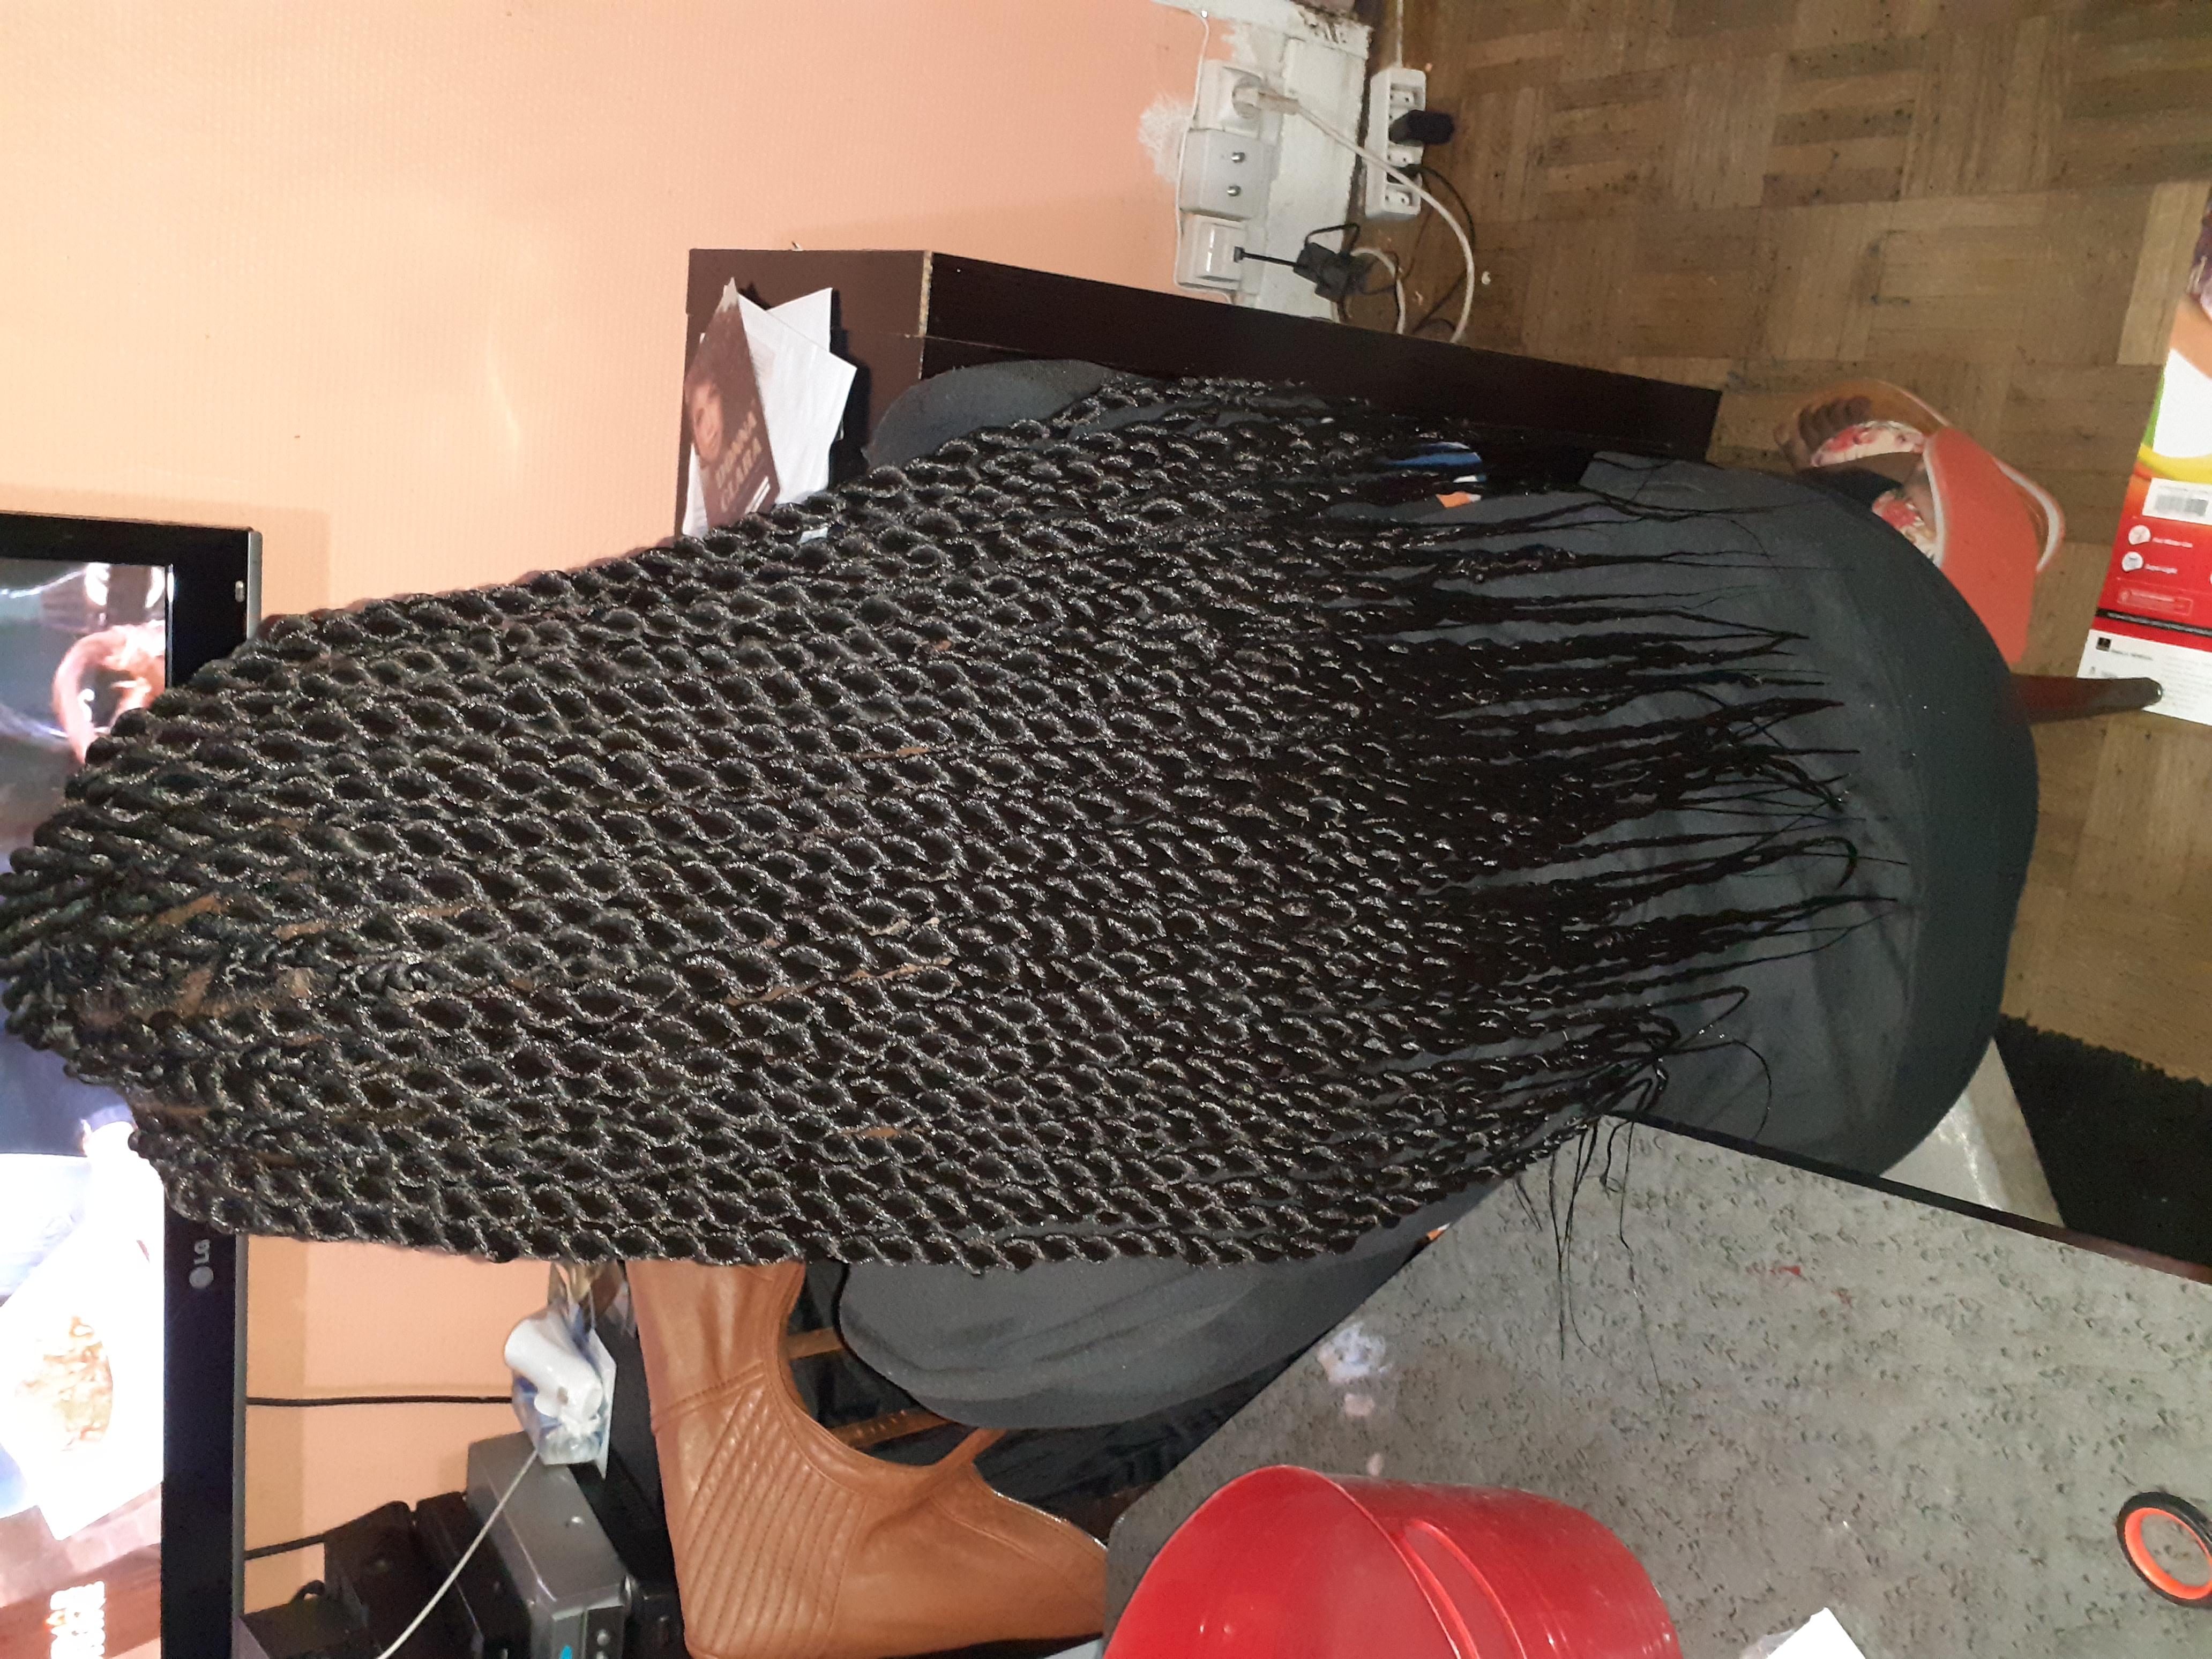 salon de coiffure afro tresse tresses box braids crochet braids vanilles tissages paris 75 77 78 91 92 93 94 95 TUUWWBTA